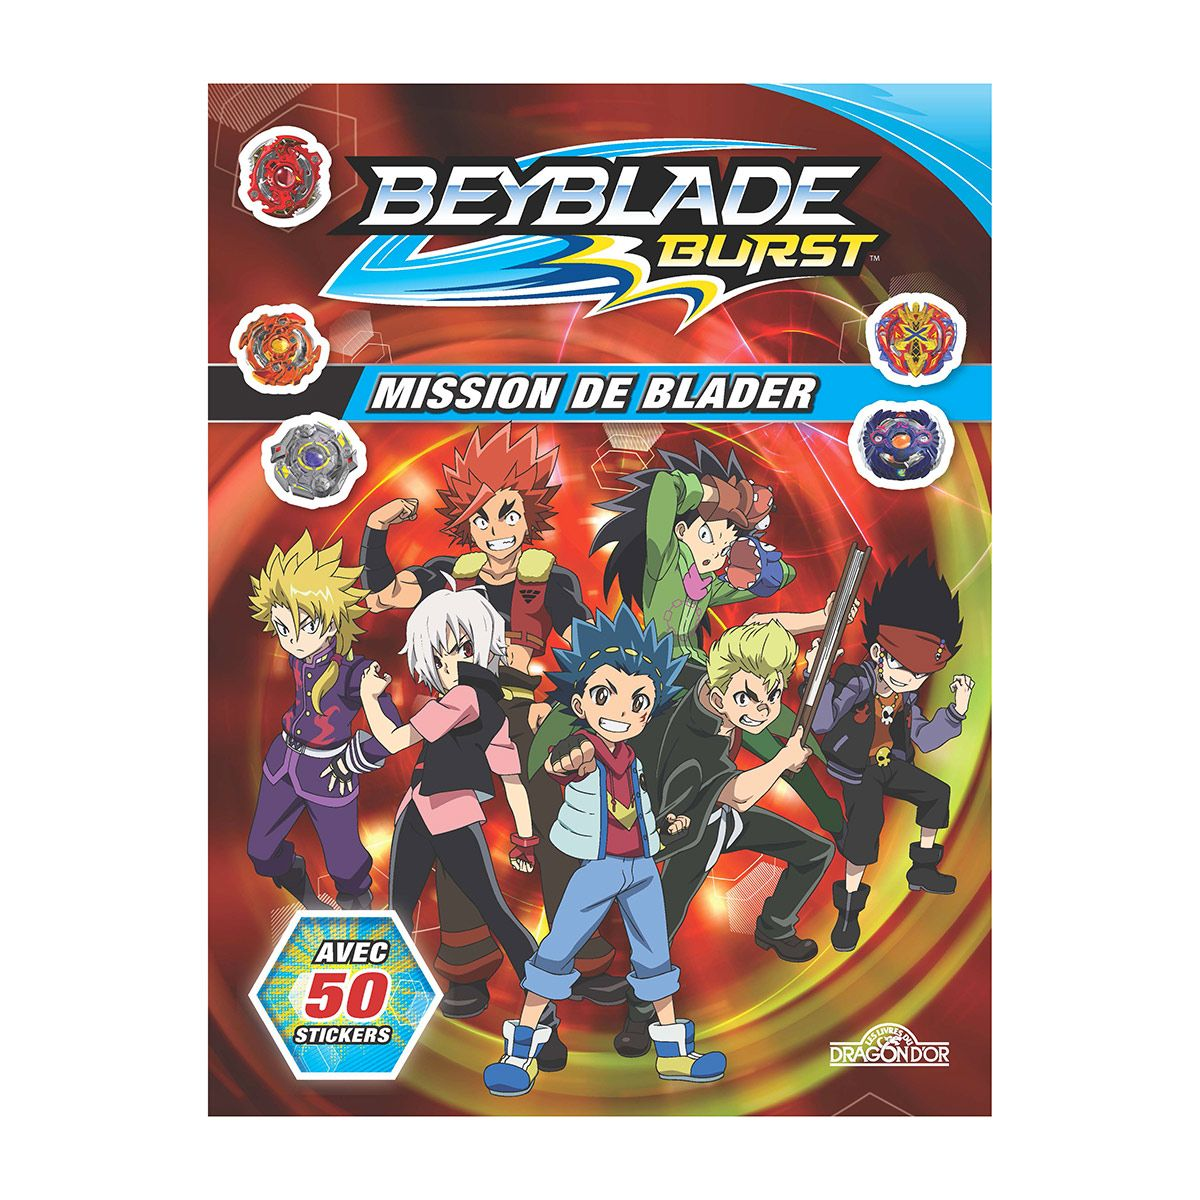 Livre Jeu Beyblade Mission De Blader Jeux Educatifs La